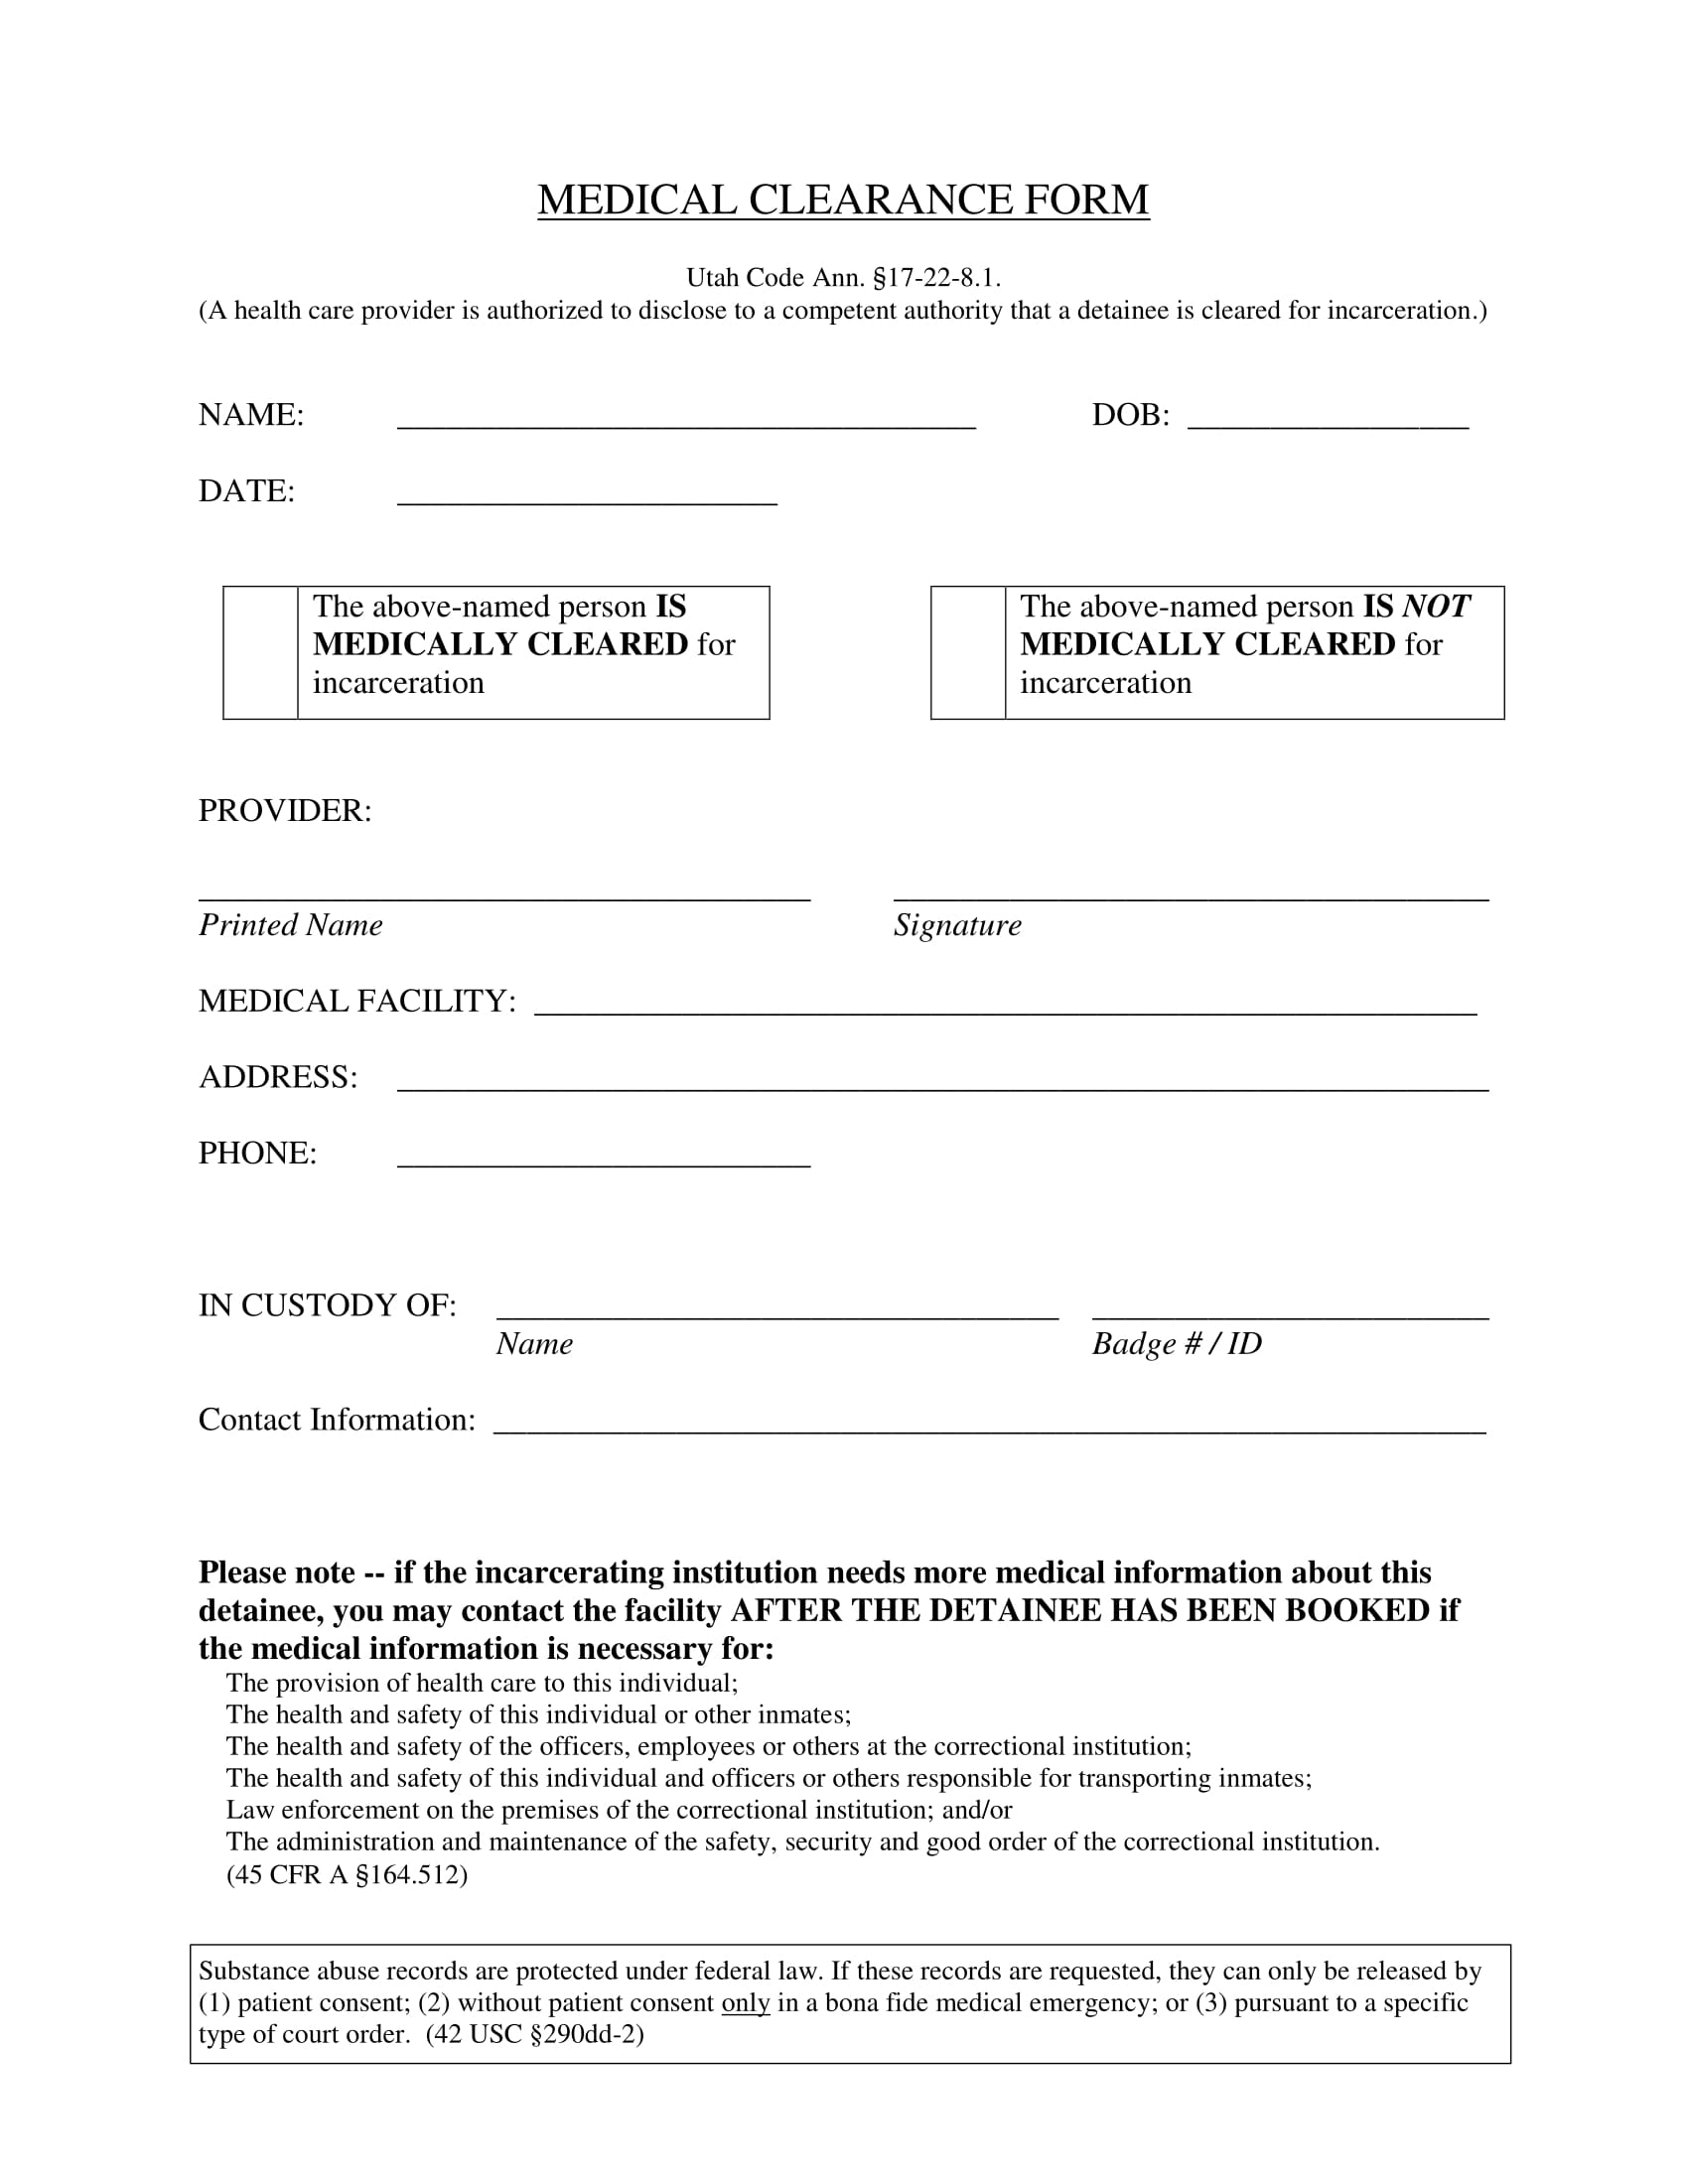 incarceration medical clearance form 1